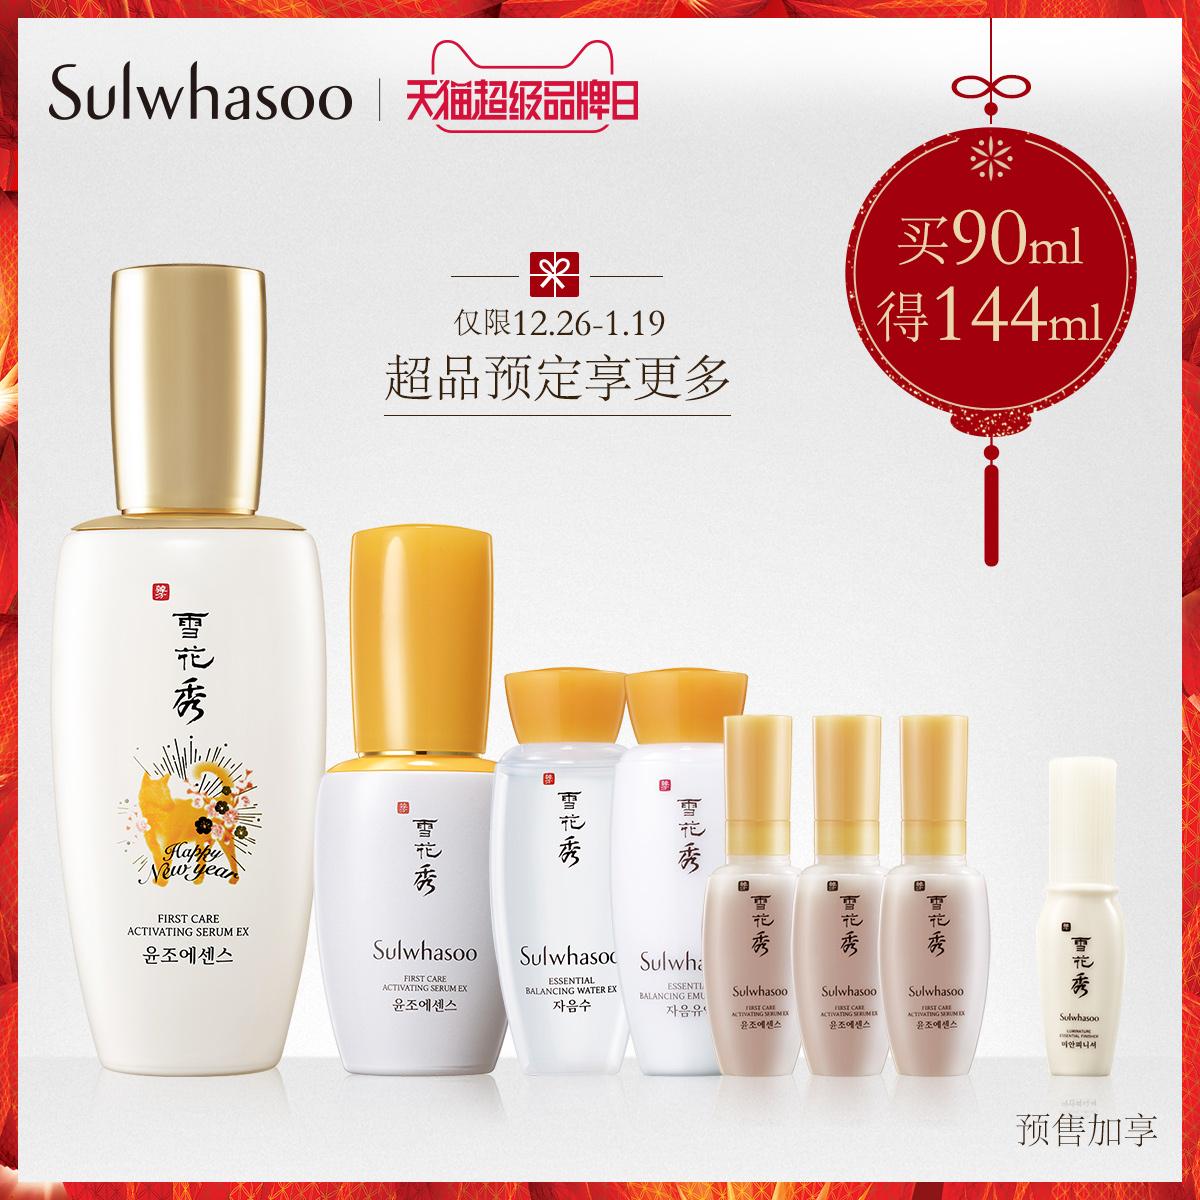 Sulwhasoo雪花秀官方旗舰店